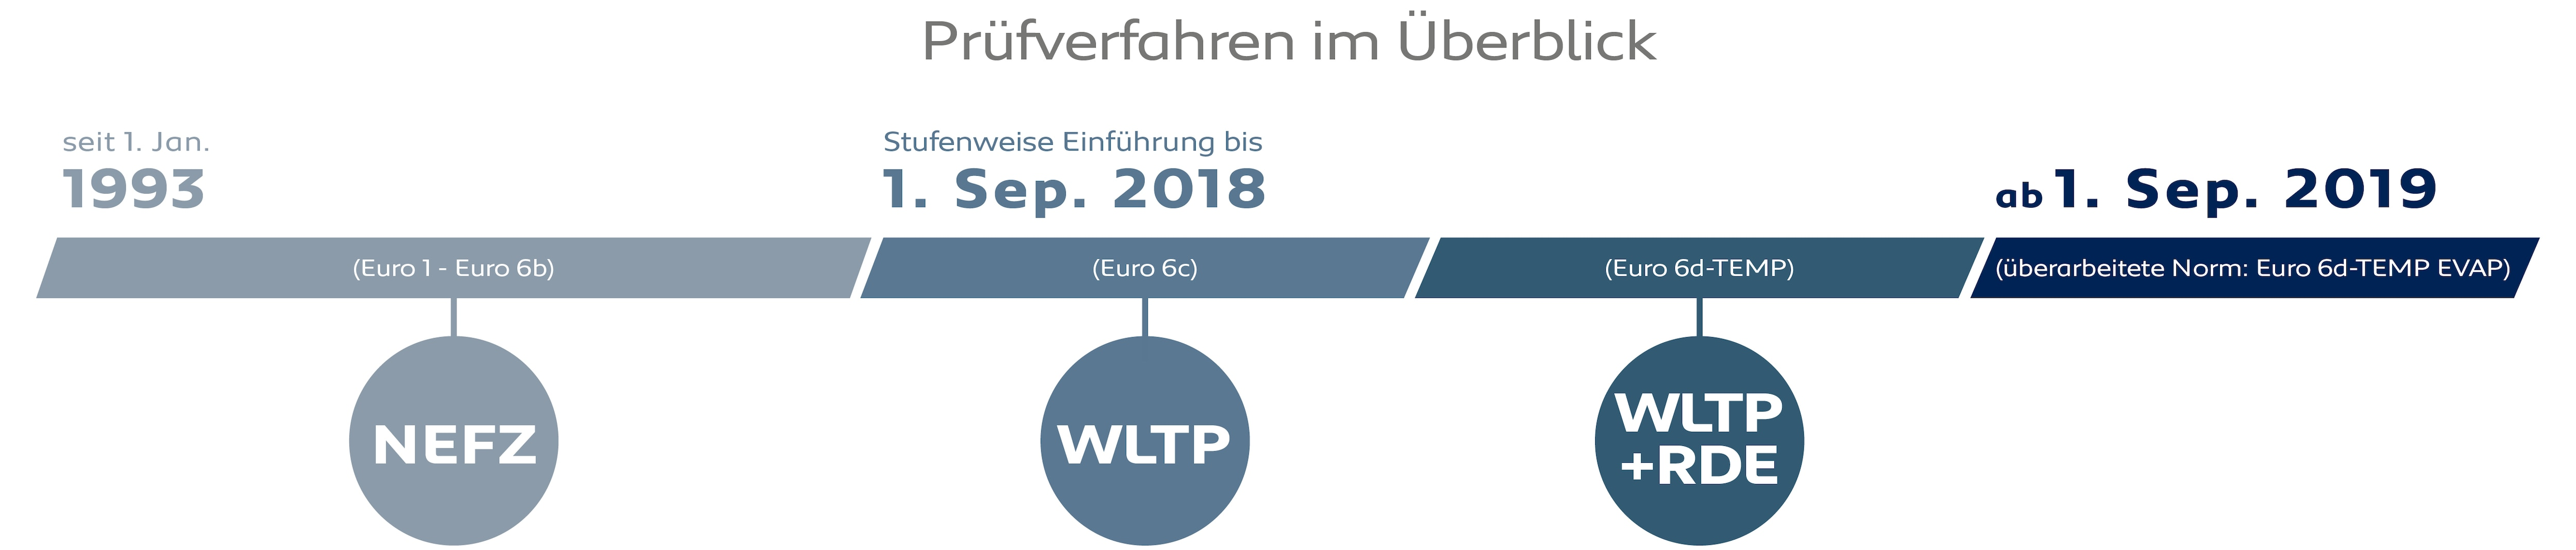 PEUGEOT Euro 6d-TEMP Zeitleiste Stufenweise Einfuehrung WLTP RDE